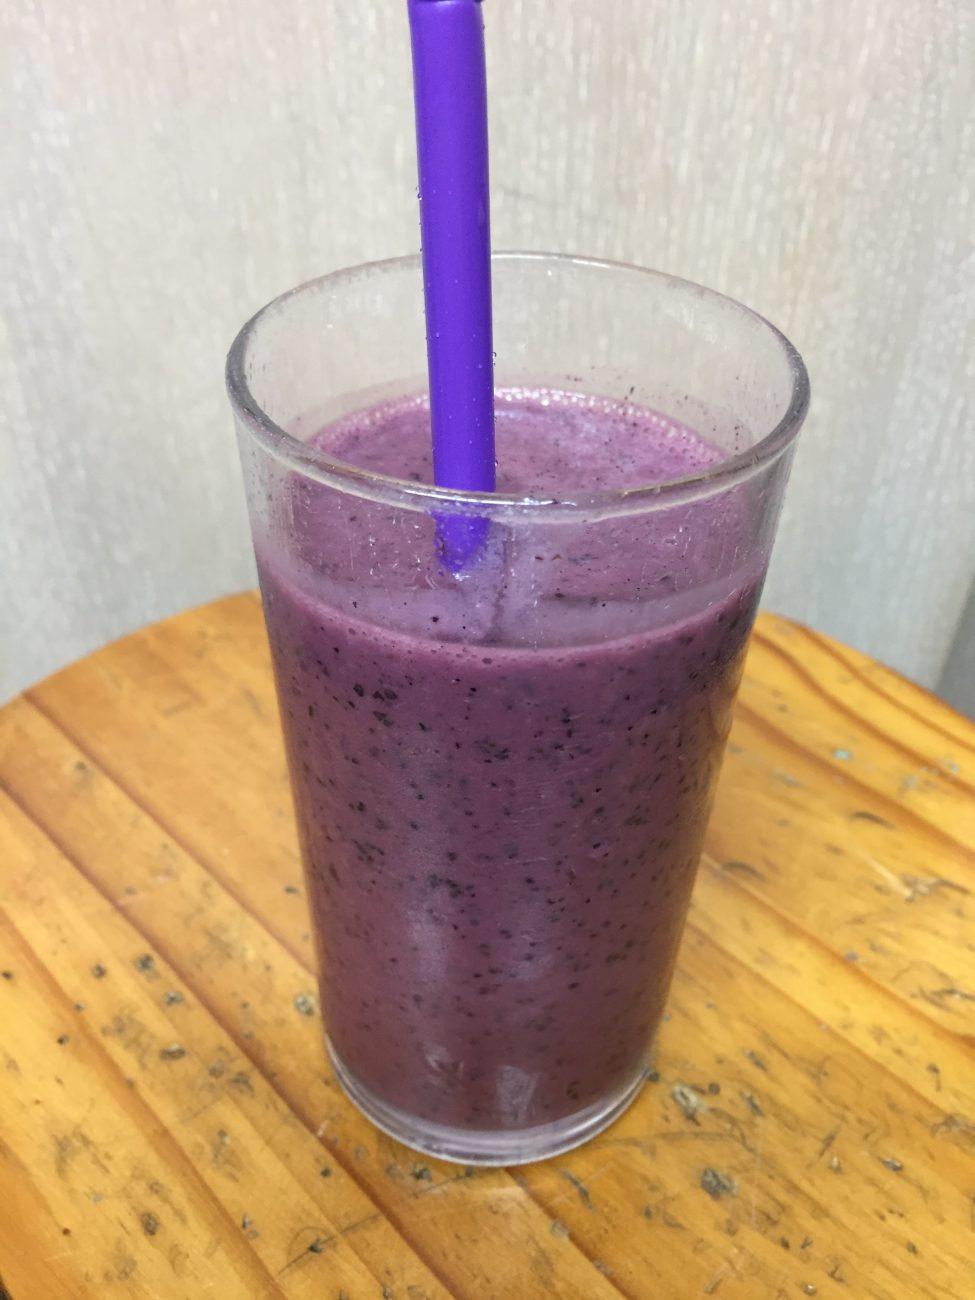 Blueberry & Vanilla Thickshake